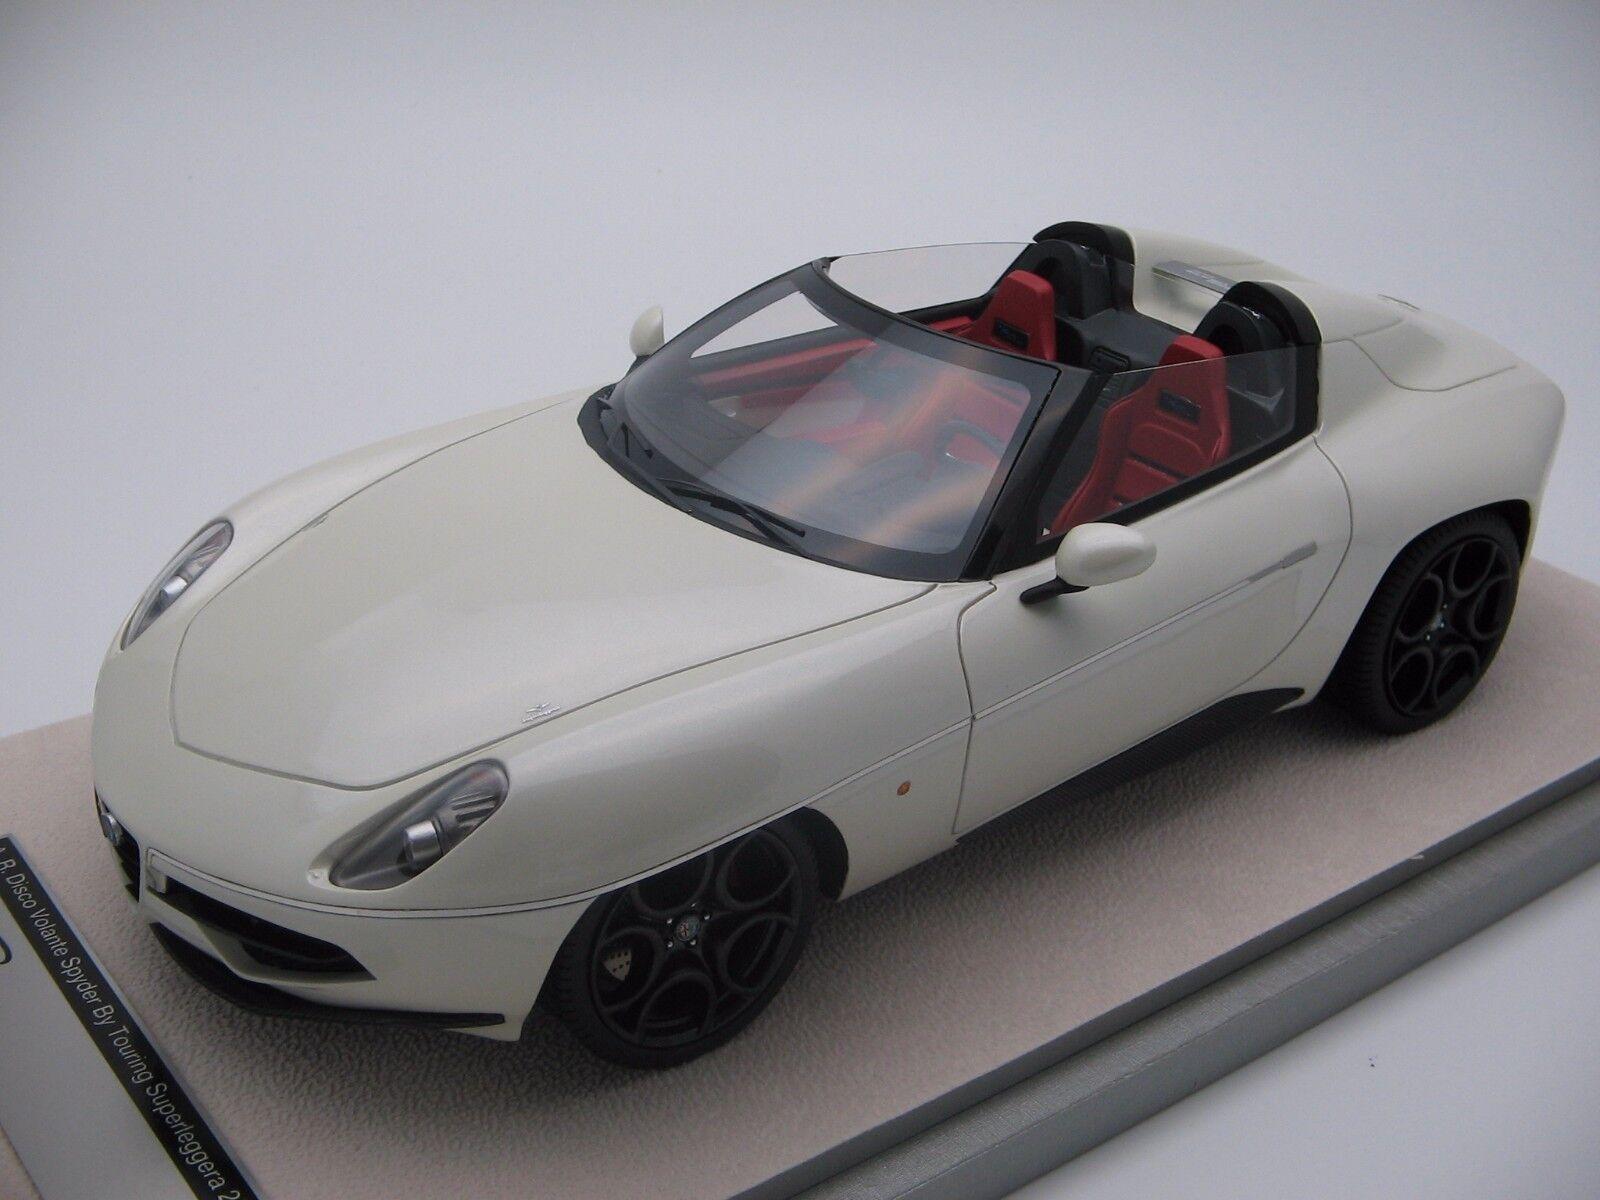 1 18 scale Tecnomodel Alfa Romeo Disco Volante Spyder by Touring TM18-68C